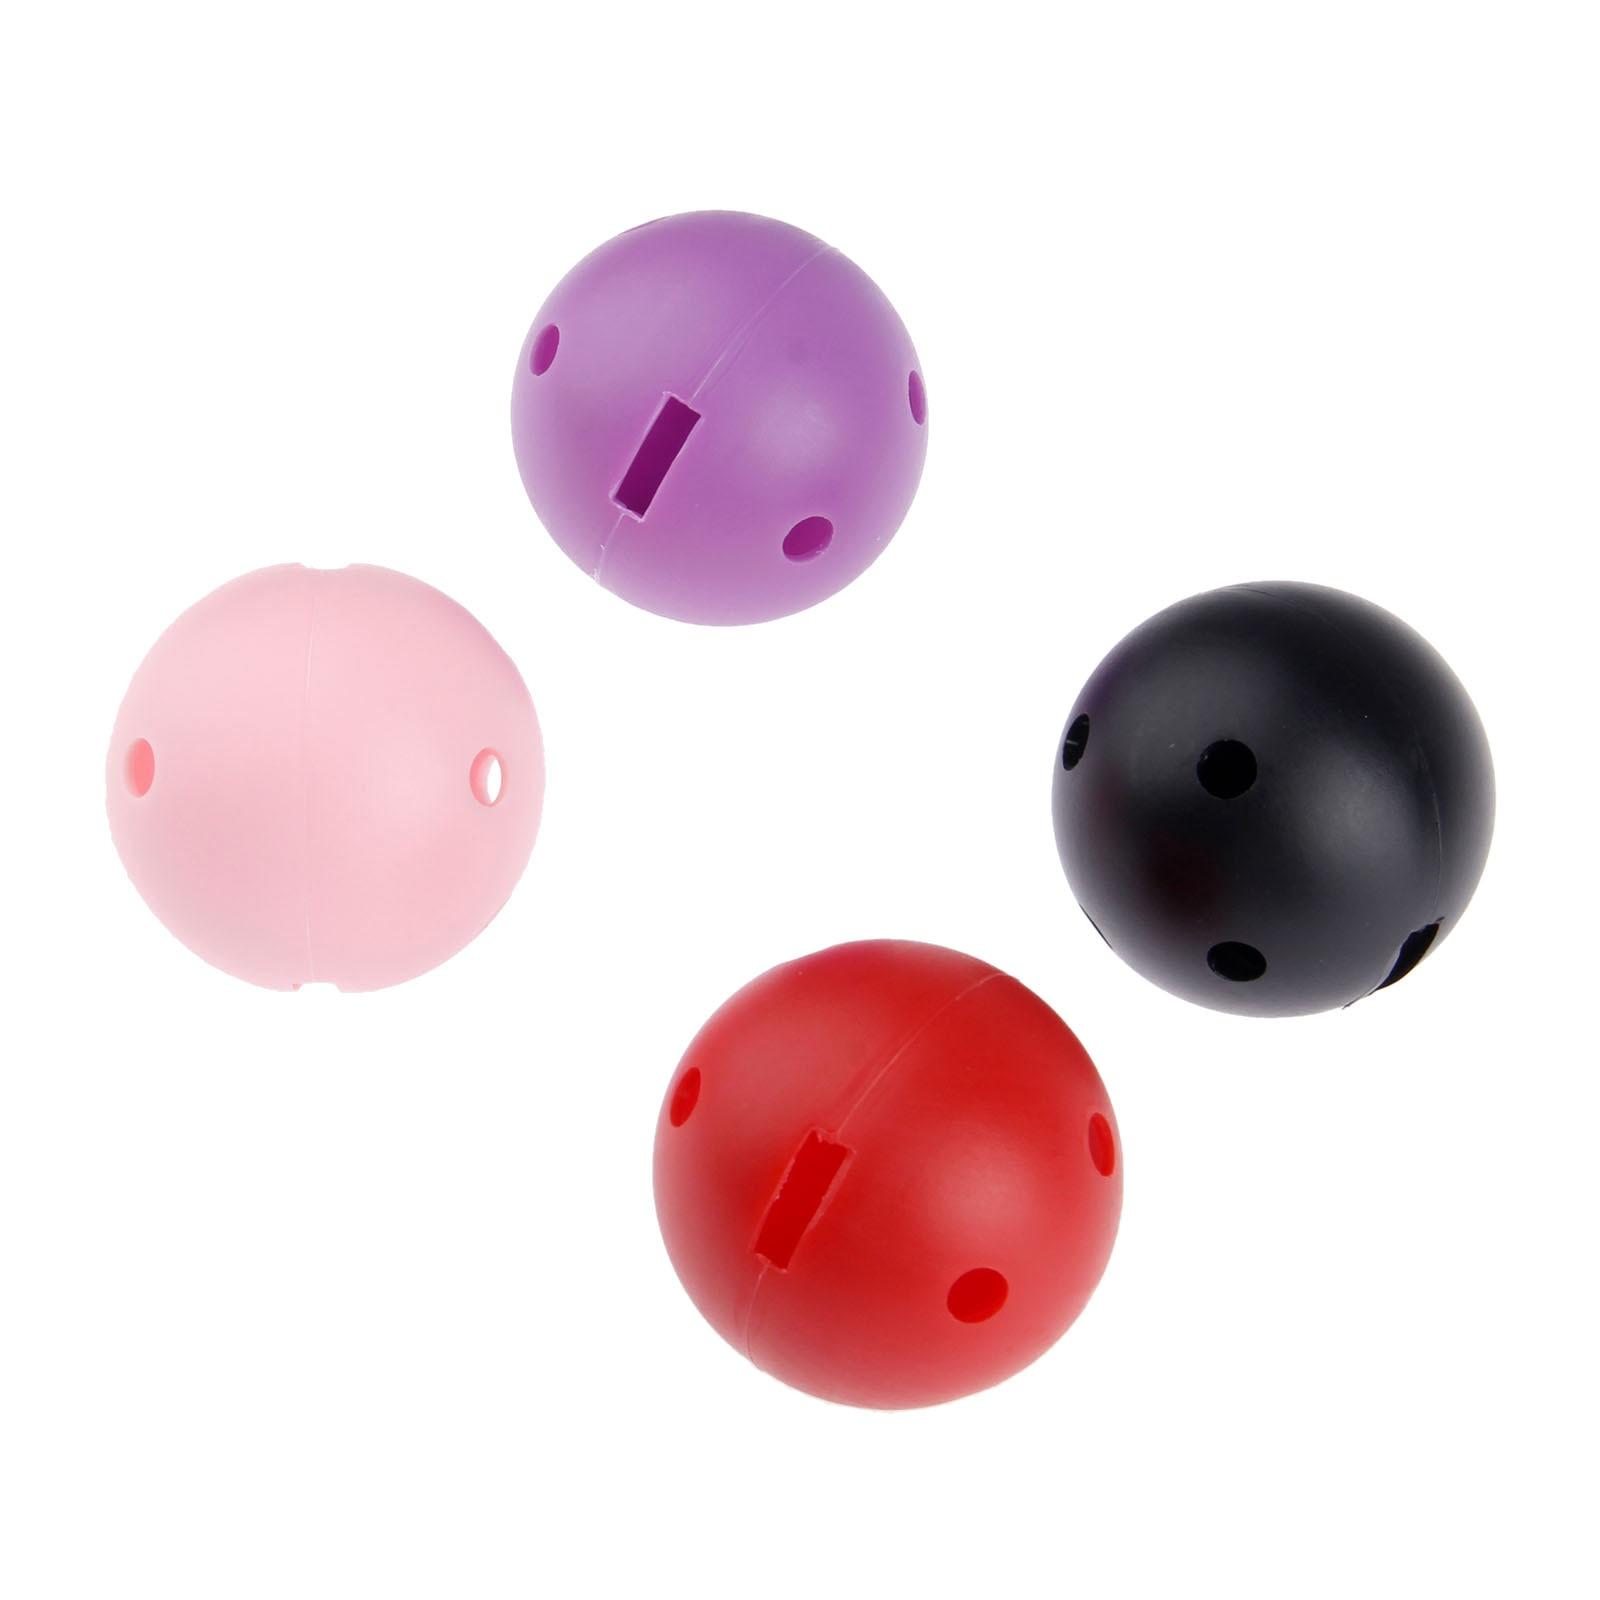 SURIEEN 10Pcs 44mm Plastic Golf Balls Blow Moulding Airflow Hollow W/ Square Holes Golf Balls Indoor Outdoor Golf Practice Balls